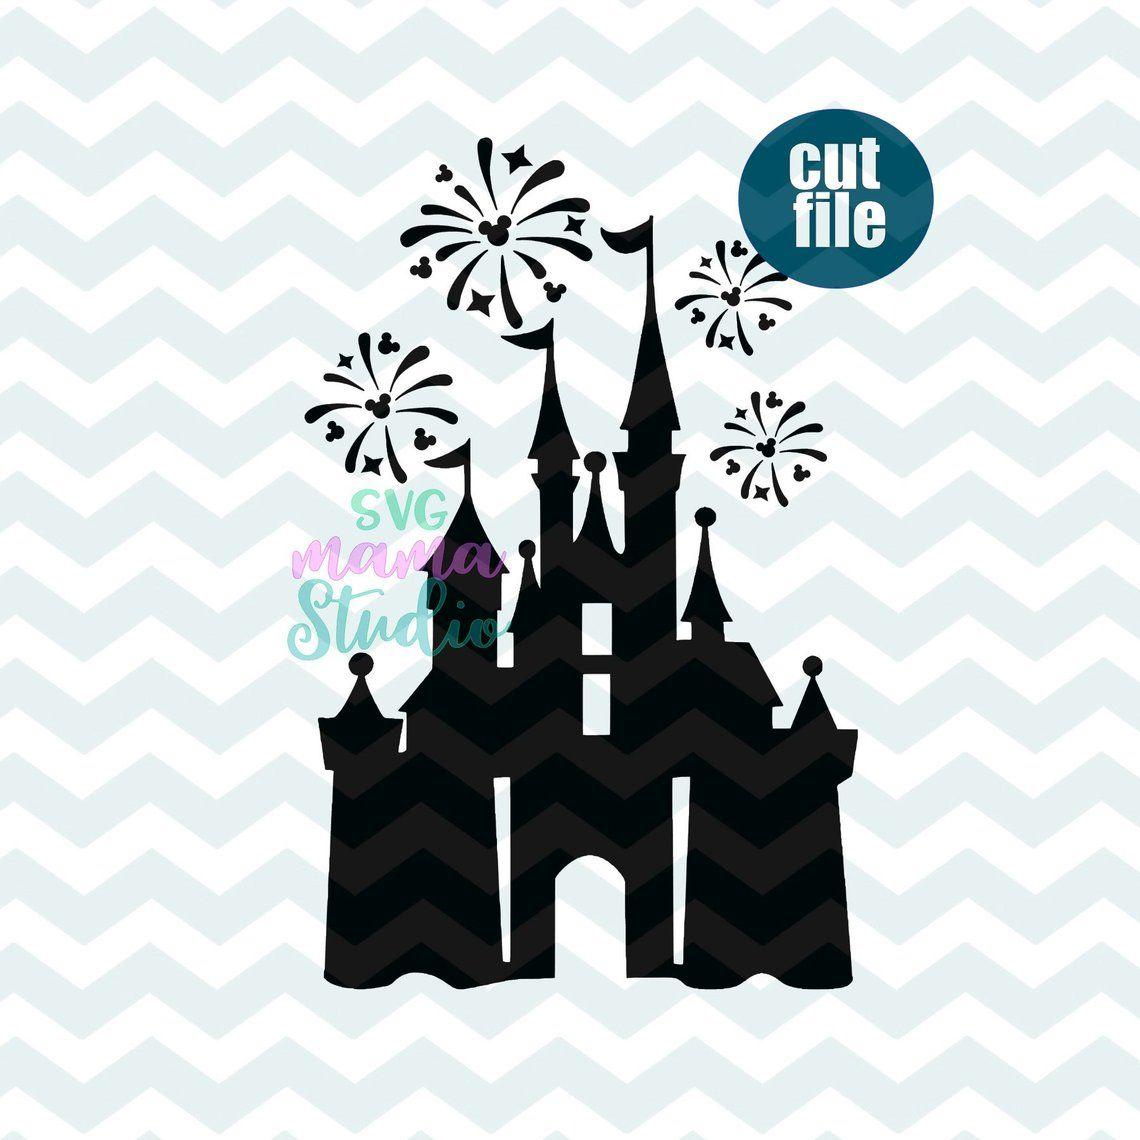 Disney Castle Fireworks svg, dxf, png file for cricut and